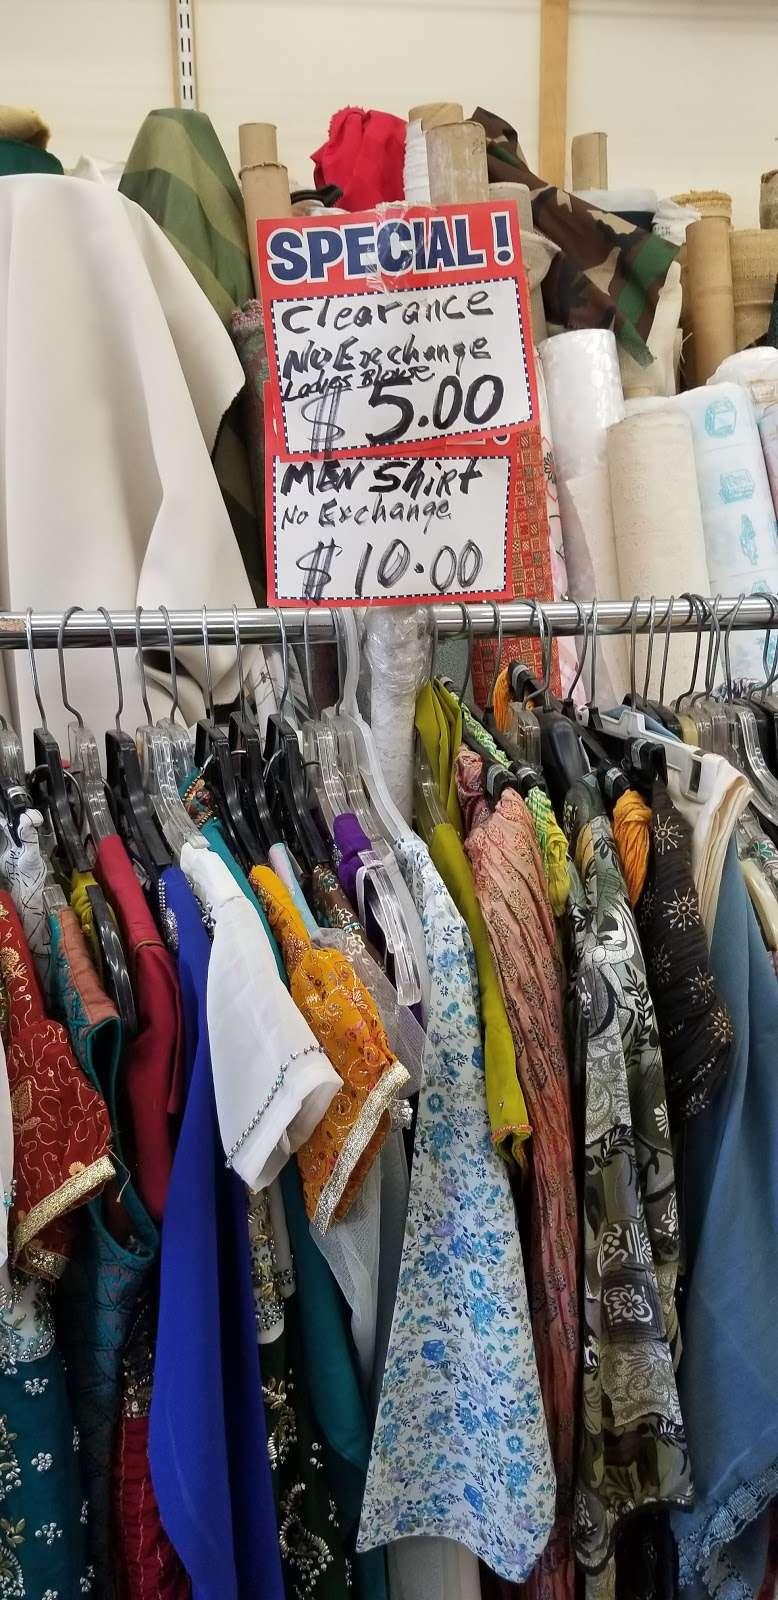 Nahid Fabrics - home goods store  | Photo 3 of 3 | Address: 1049 Liberty Ave, Brooklyn, NY 11208, USA | Phone: (718) 277-9337